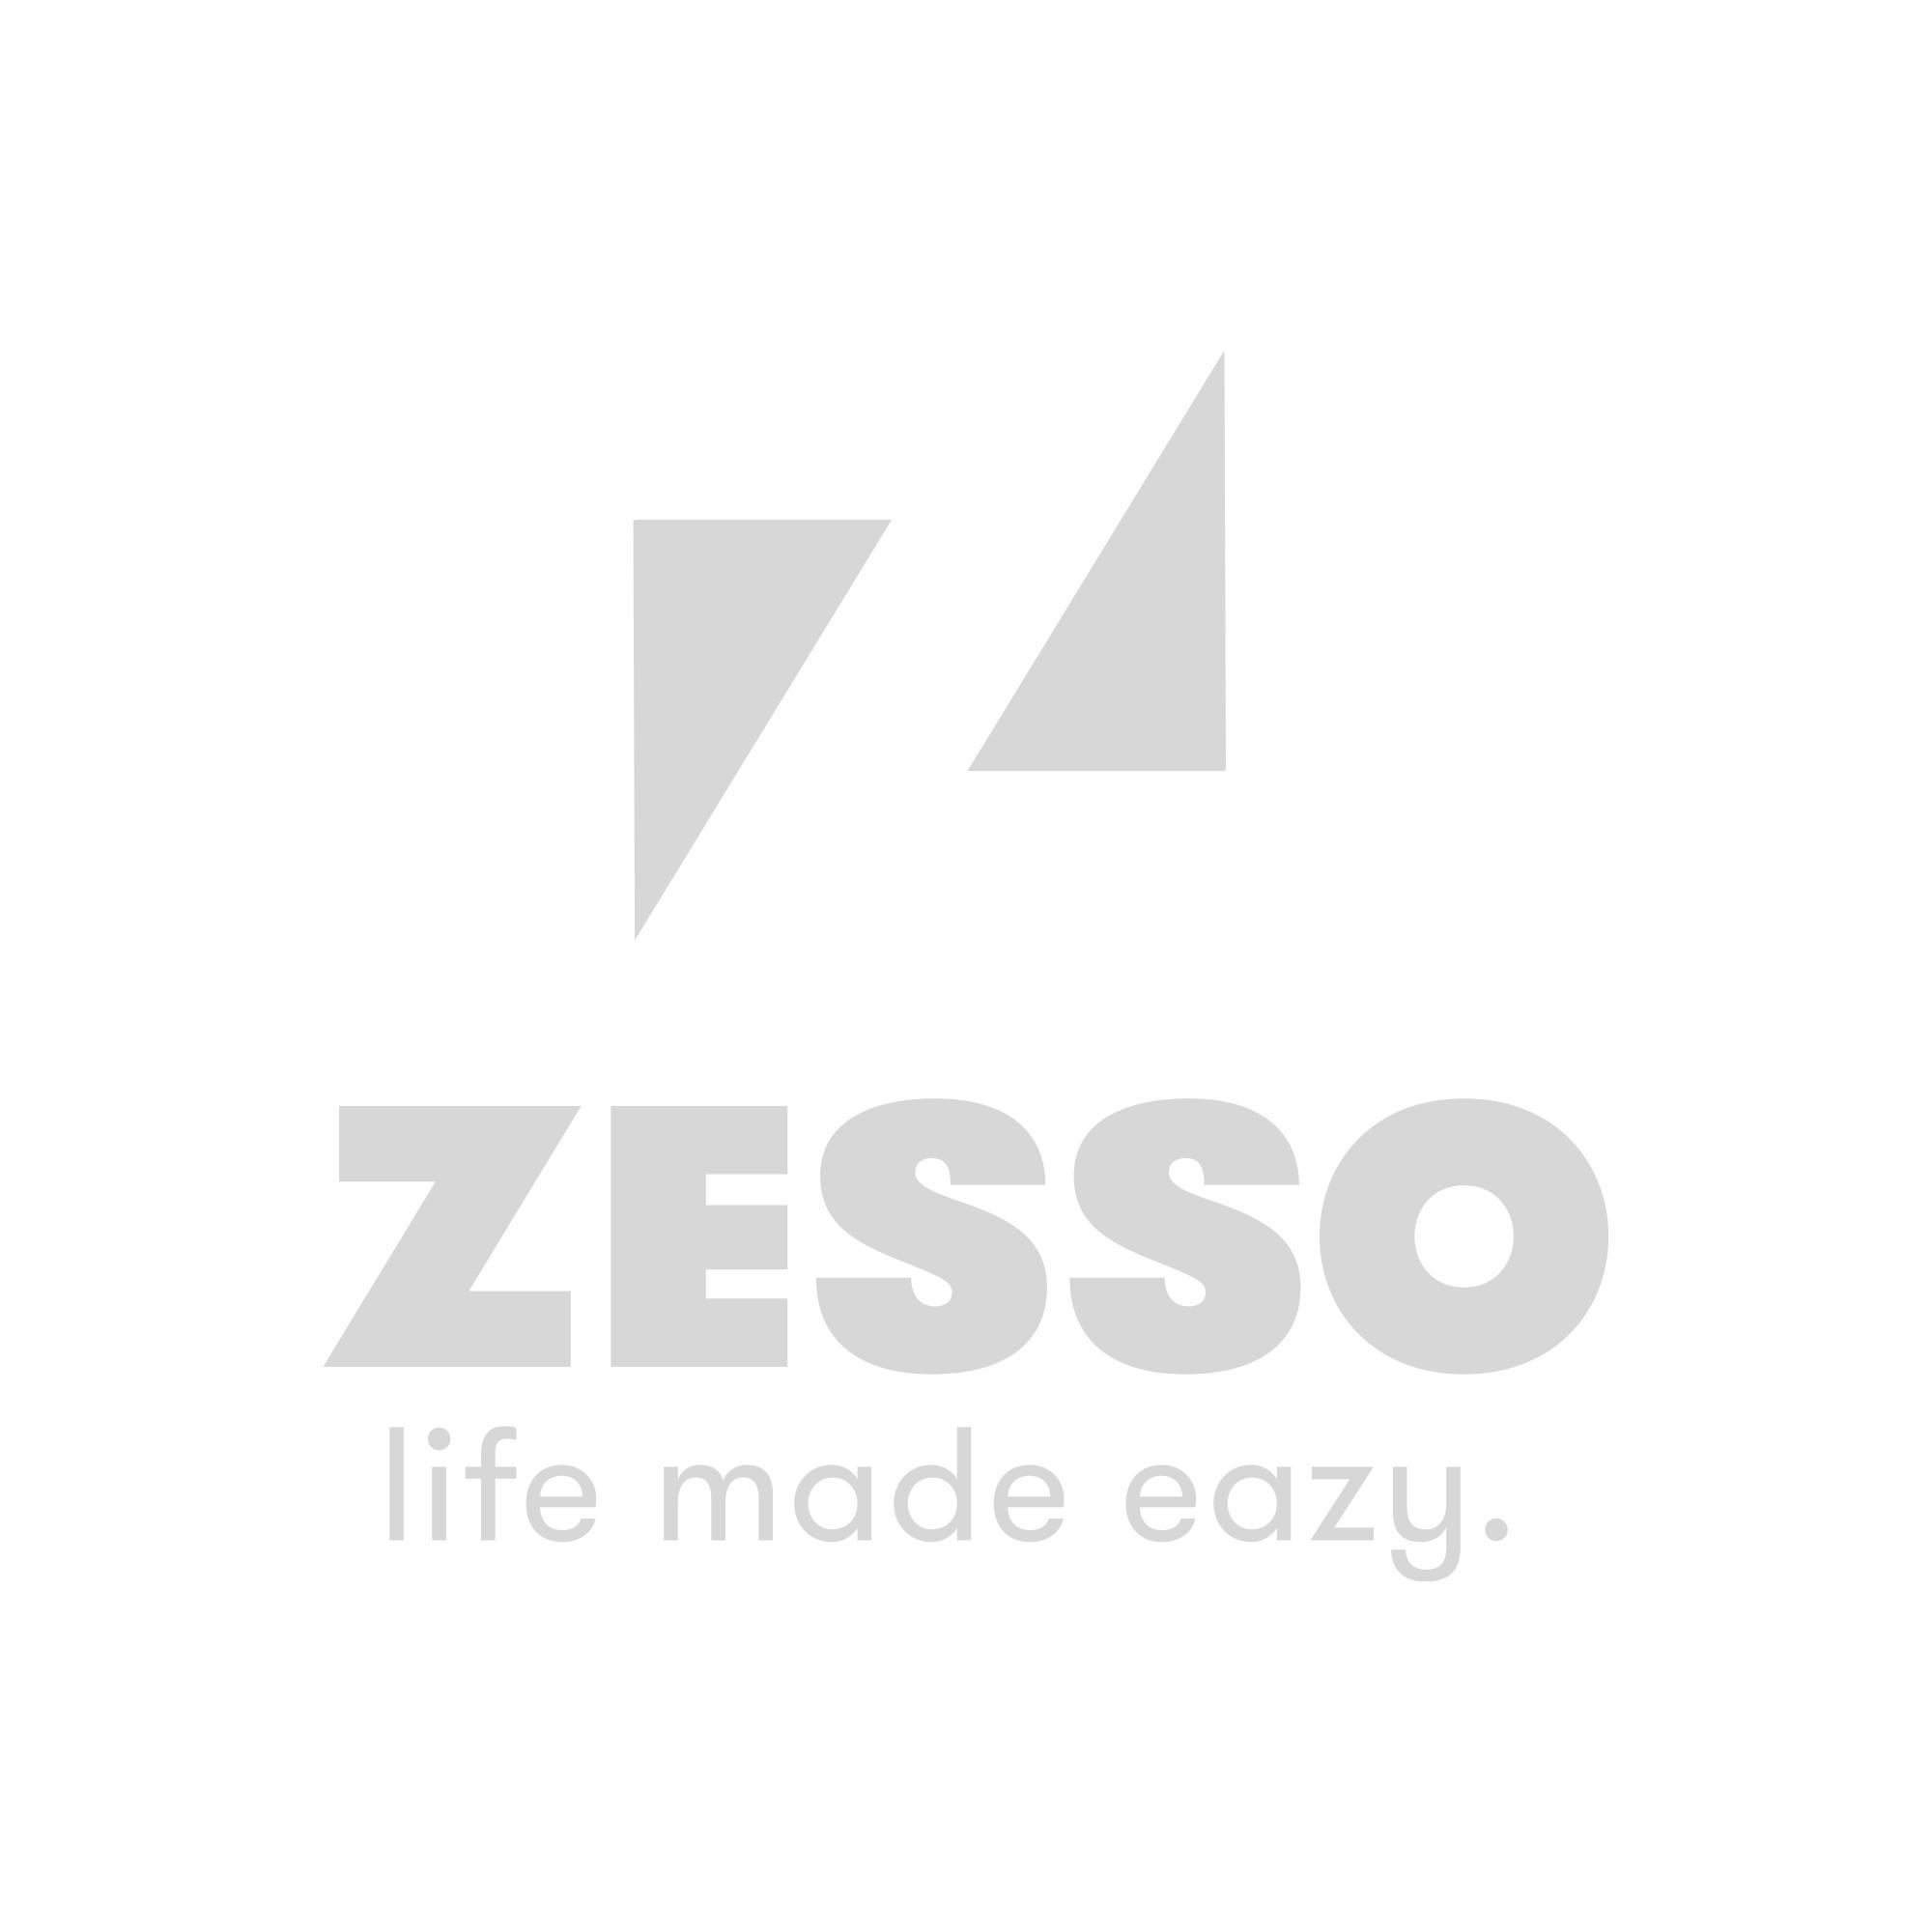 Dalber Lampe À Suspension Stars Gris - Glow In The Dark - 3 Lumières